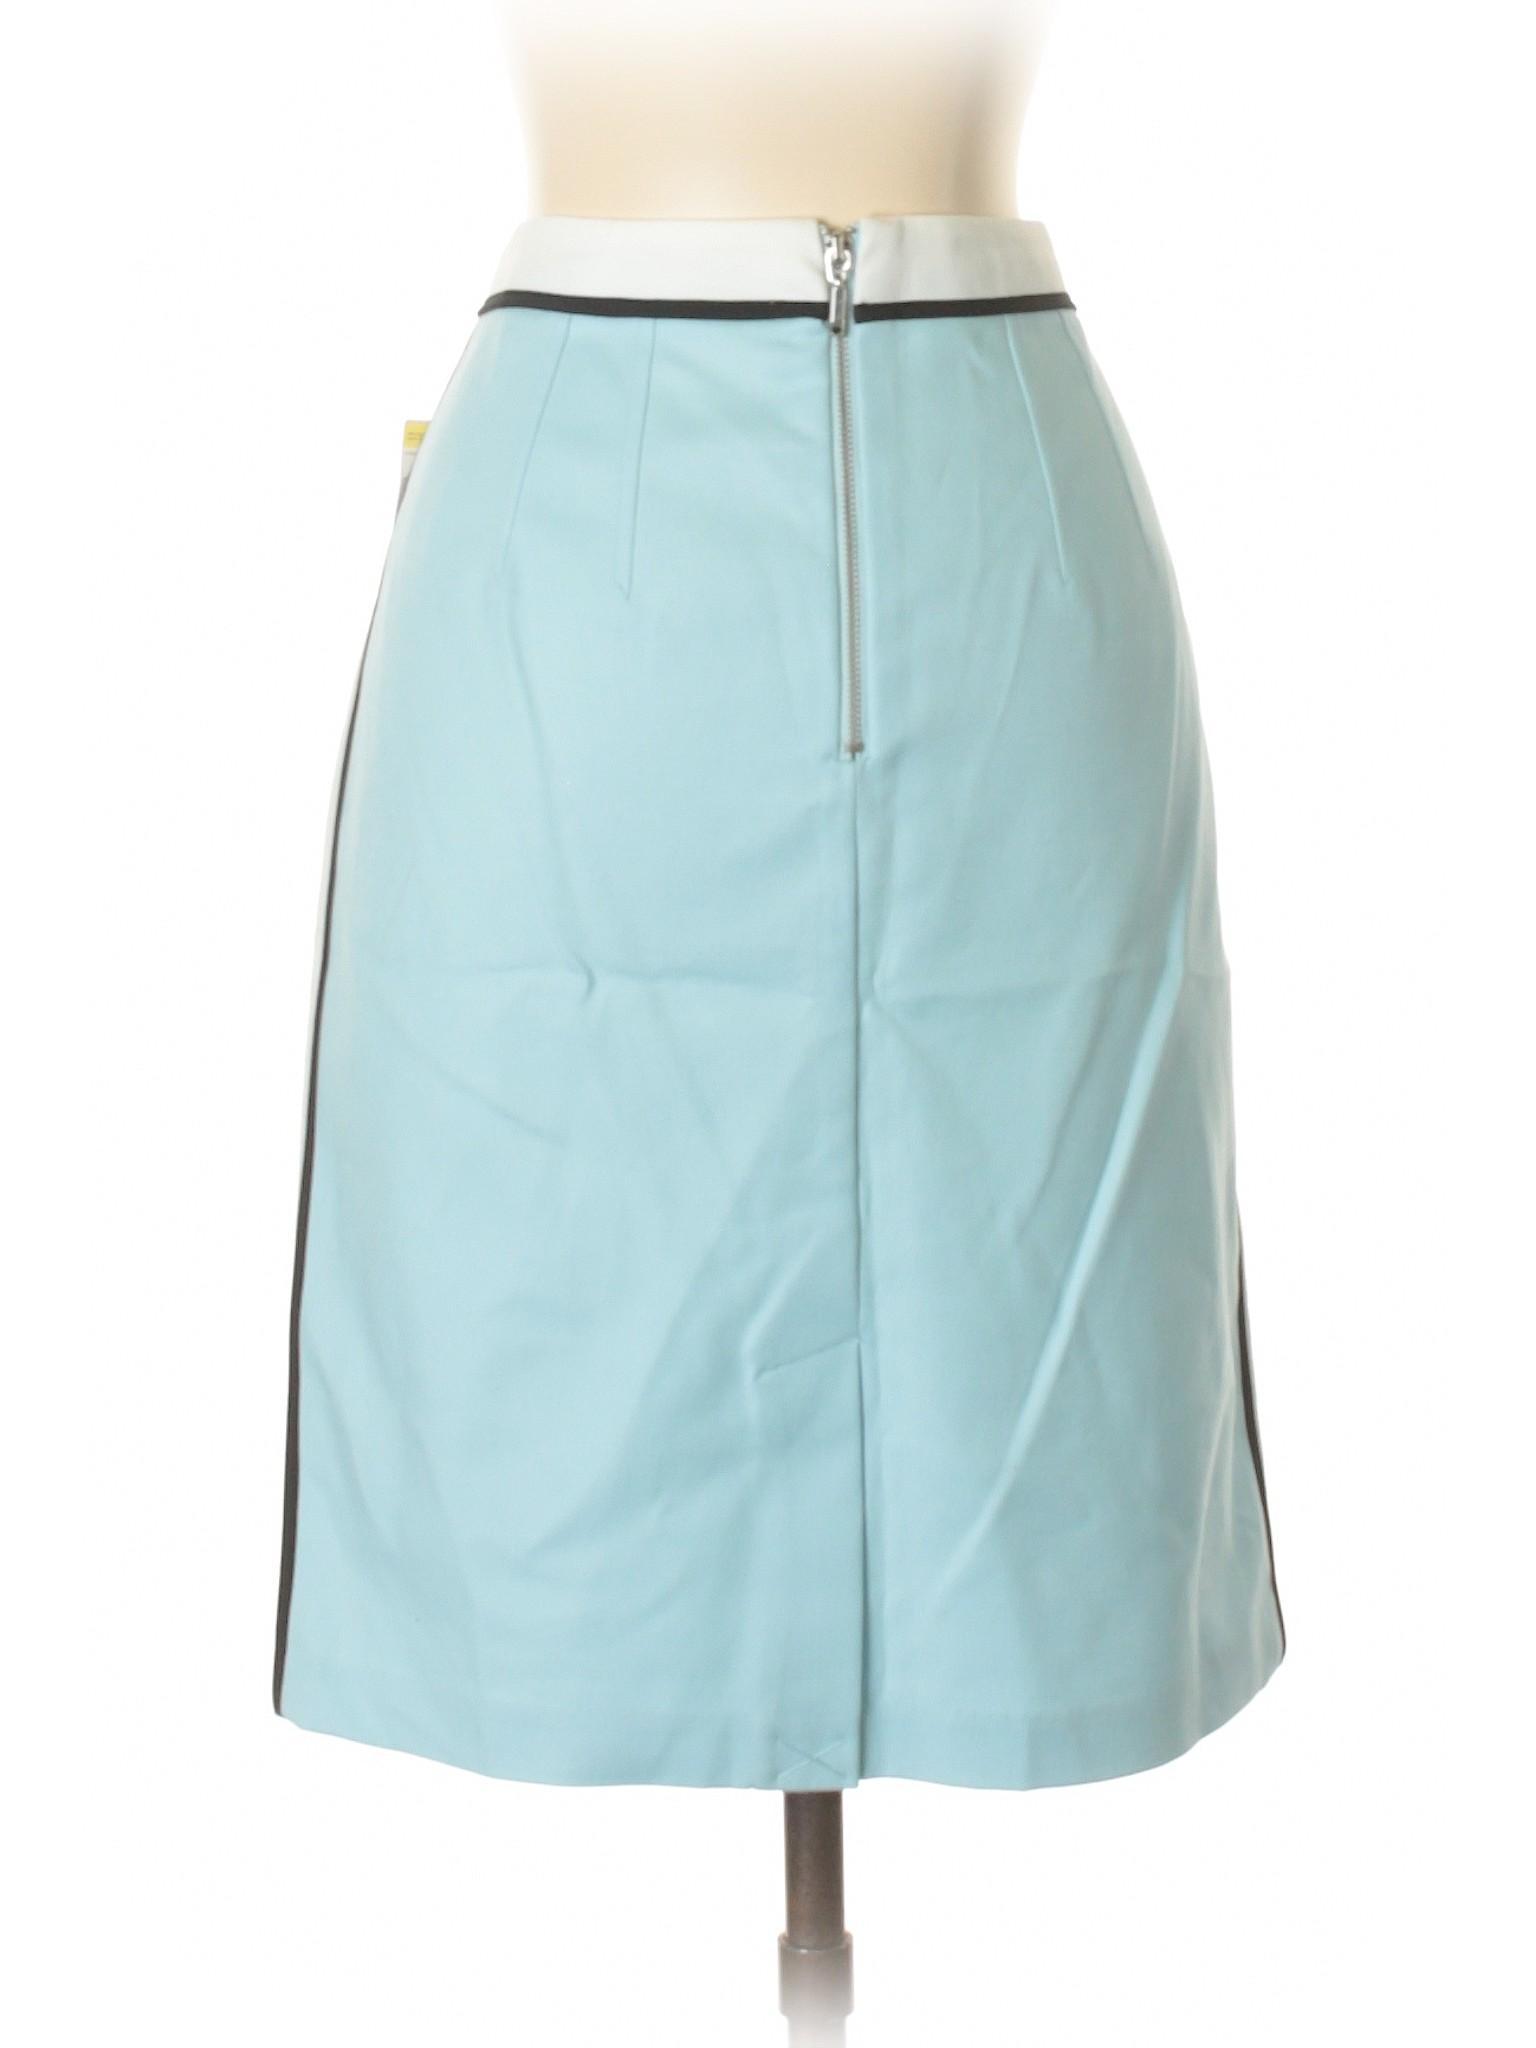 Boutique Casual Casual Skirt Skirt Casual Skirt Boutique Boutique Skirt Casual Boutique Boutique RwBqxxpz